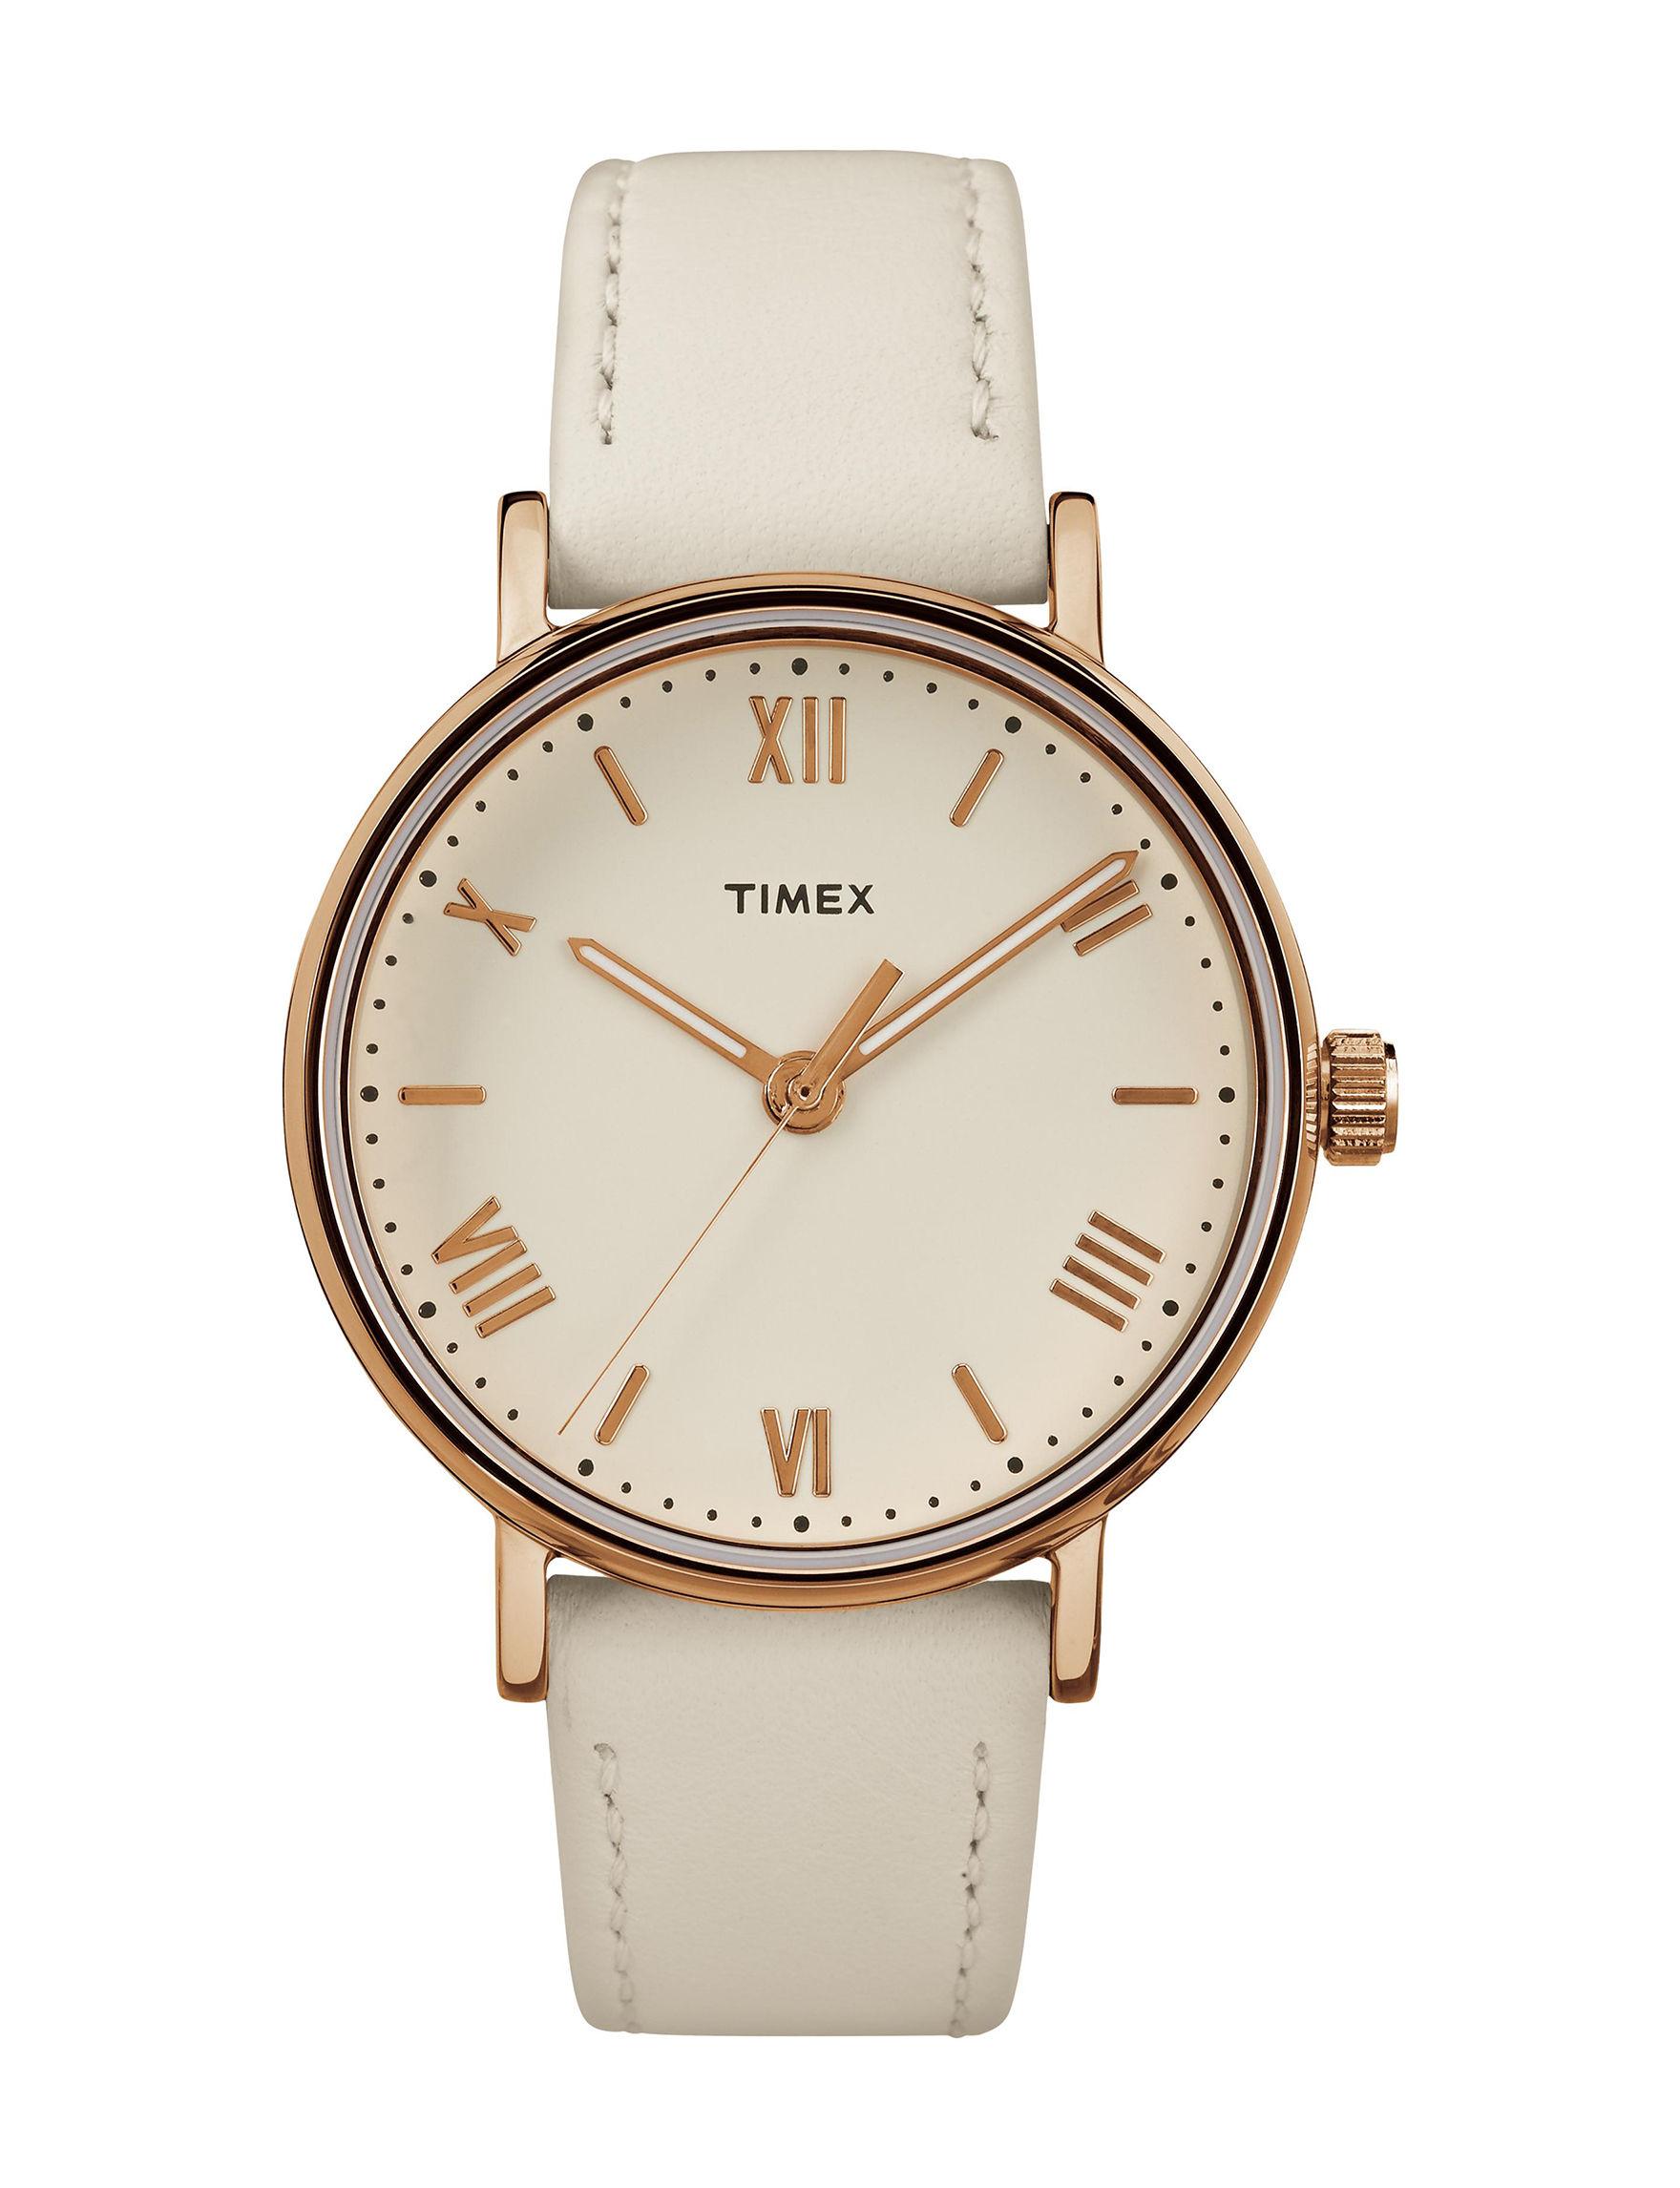 Timex White Fashion Watches